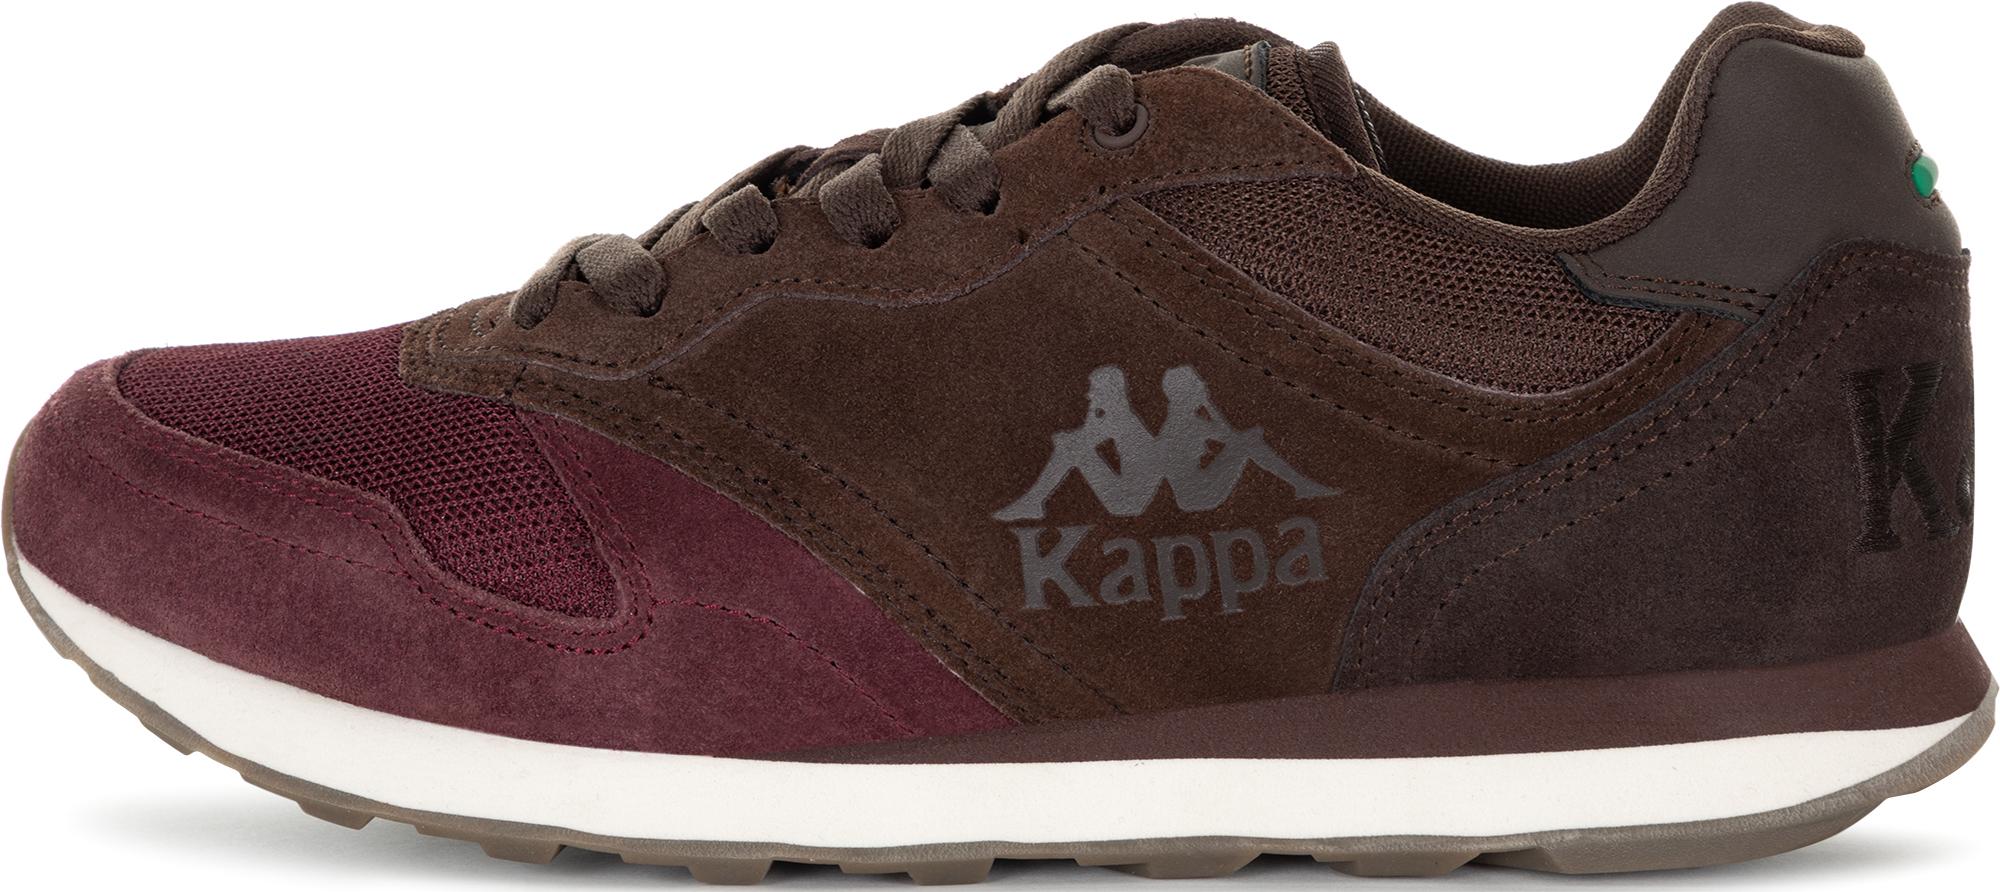 Kappa Кроссовки мужские Kappa Authentic Run, размер 45